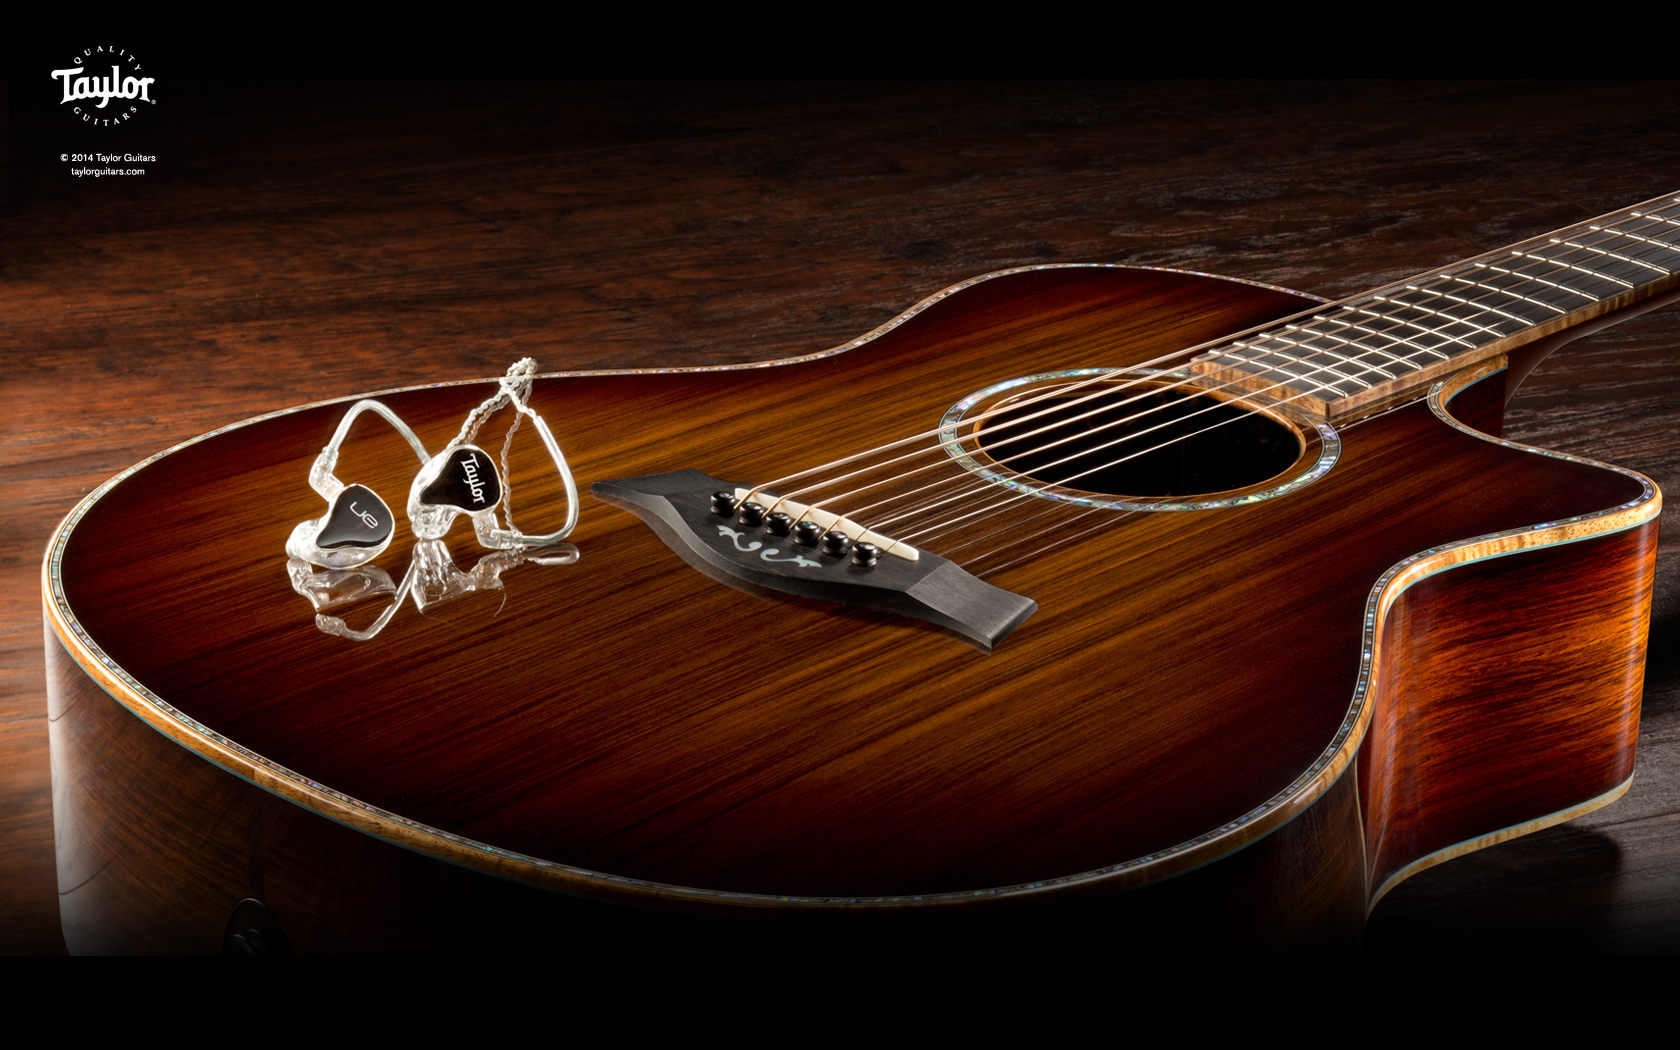 taylor guitars wallpapers - photo #19